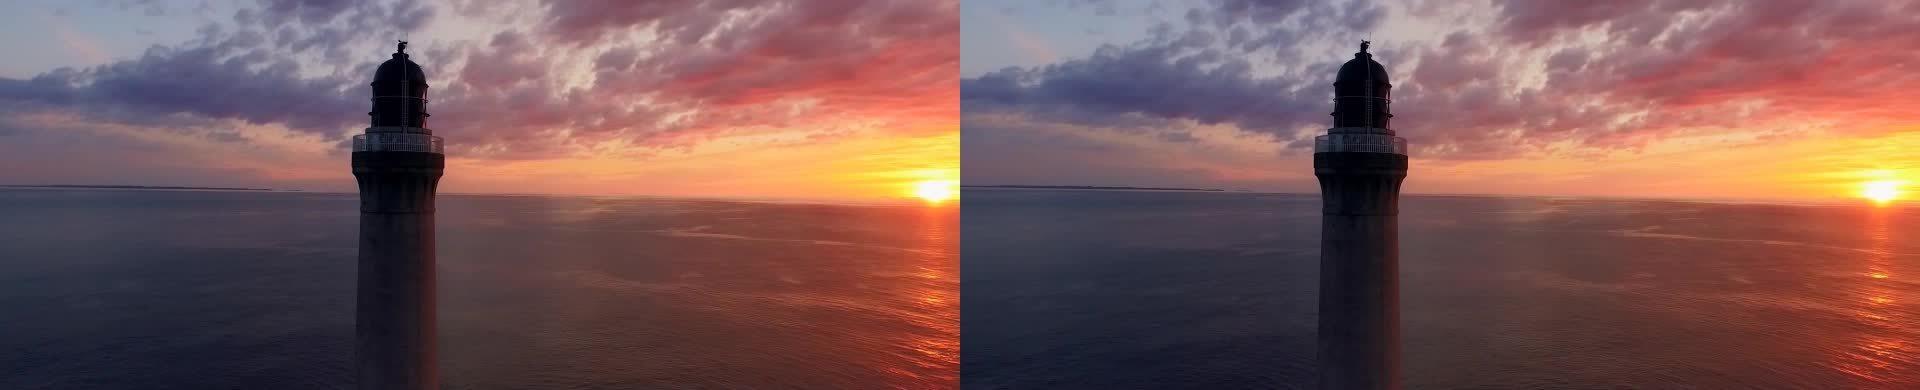 crossview, drone, Wild Scotland (Crossview Conversion) 1 GIFs